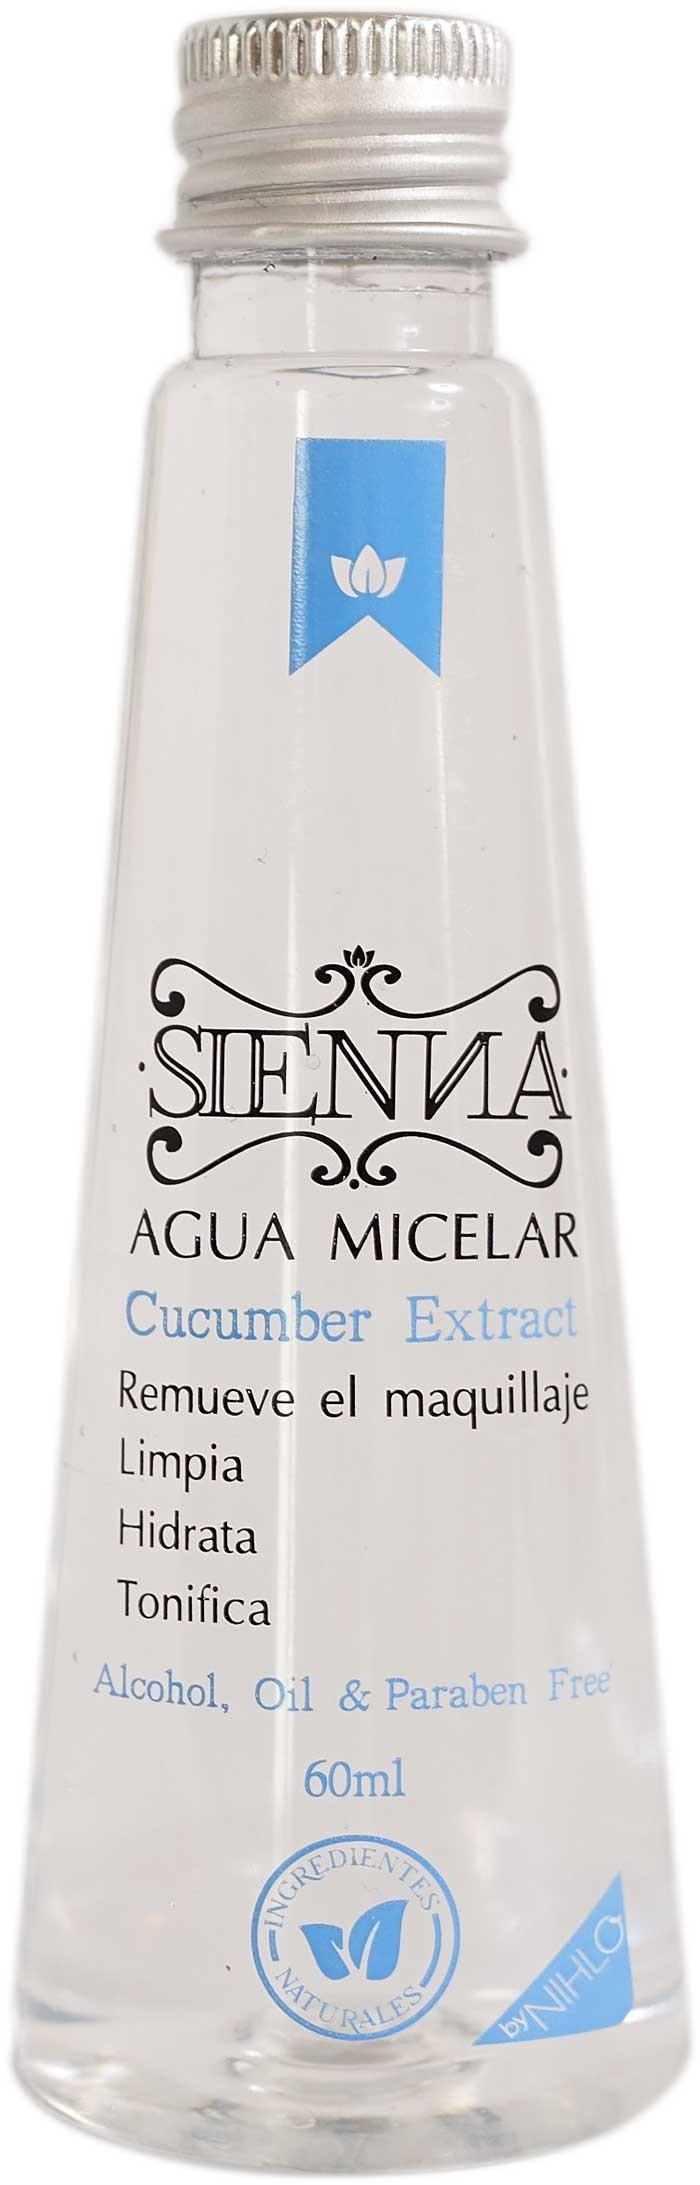 Agua Micelar 60Ml Sienna